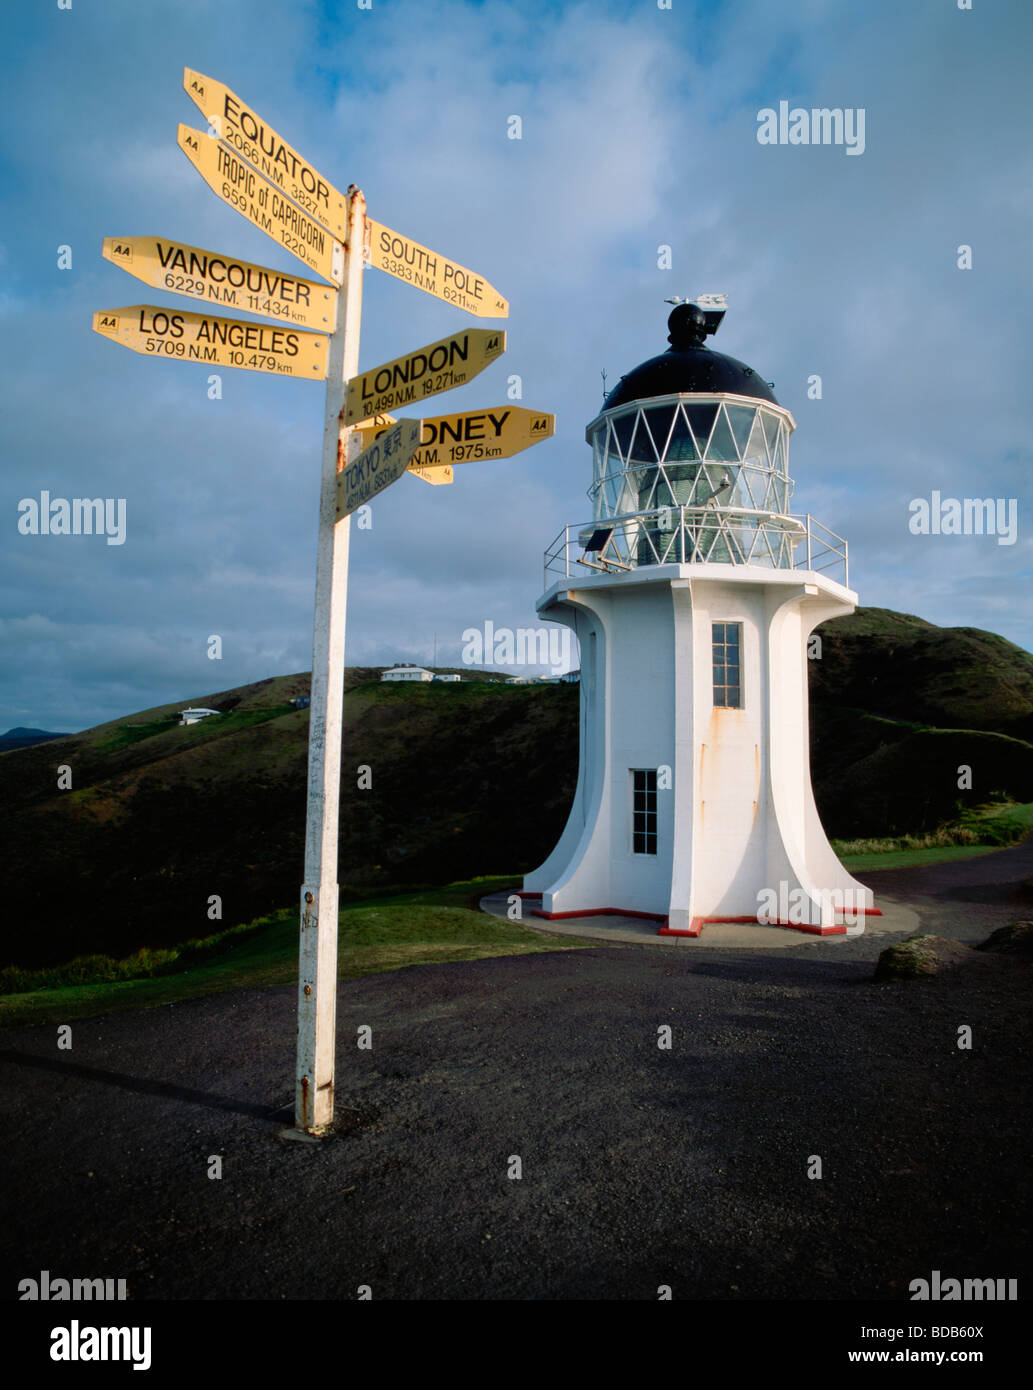 Cape Reinga light house distance sign to south pole Stock Photo